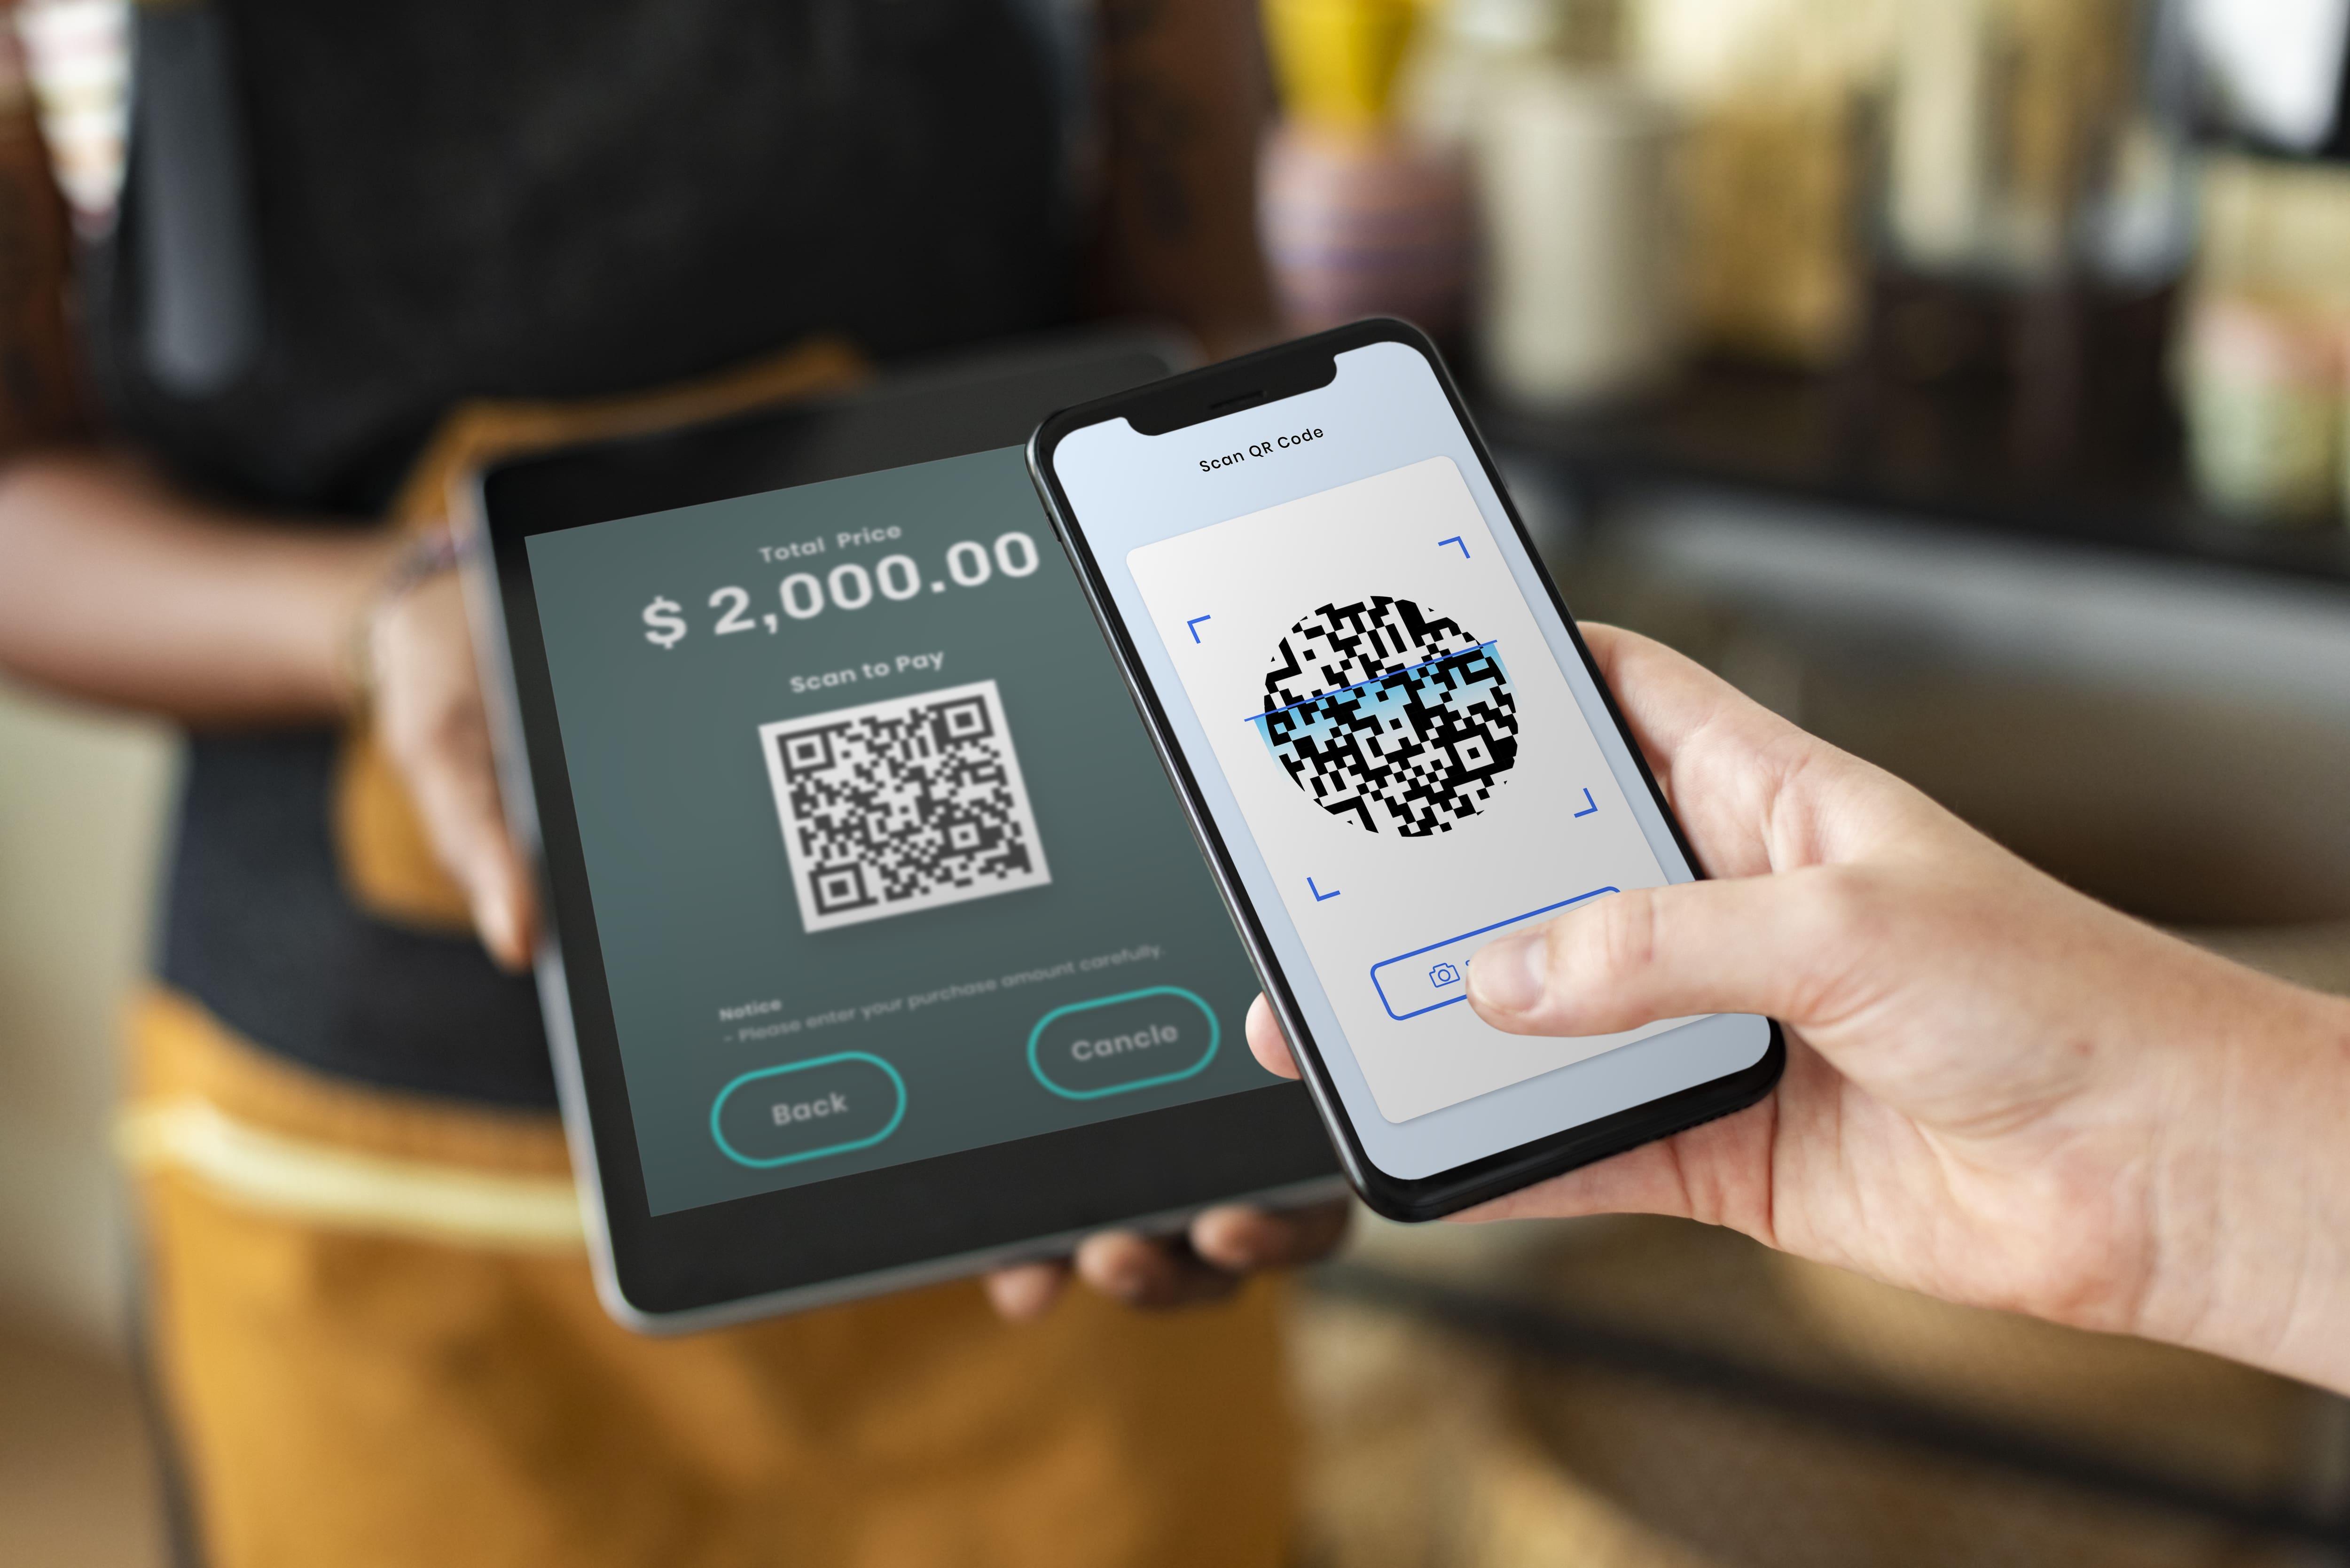 small-business-qr-code-cashless-payment-store-min